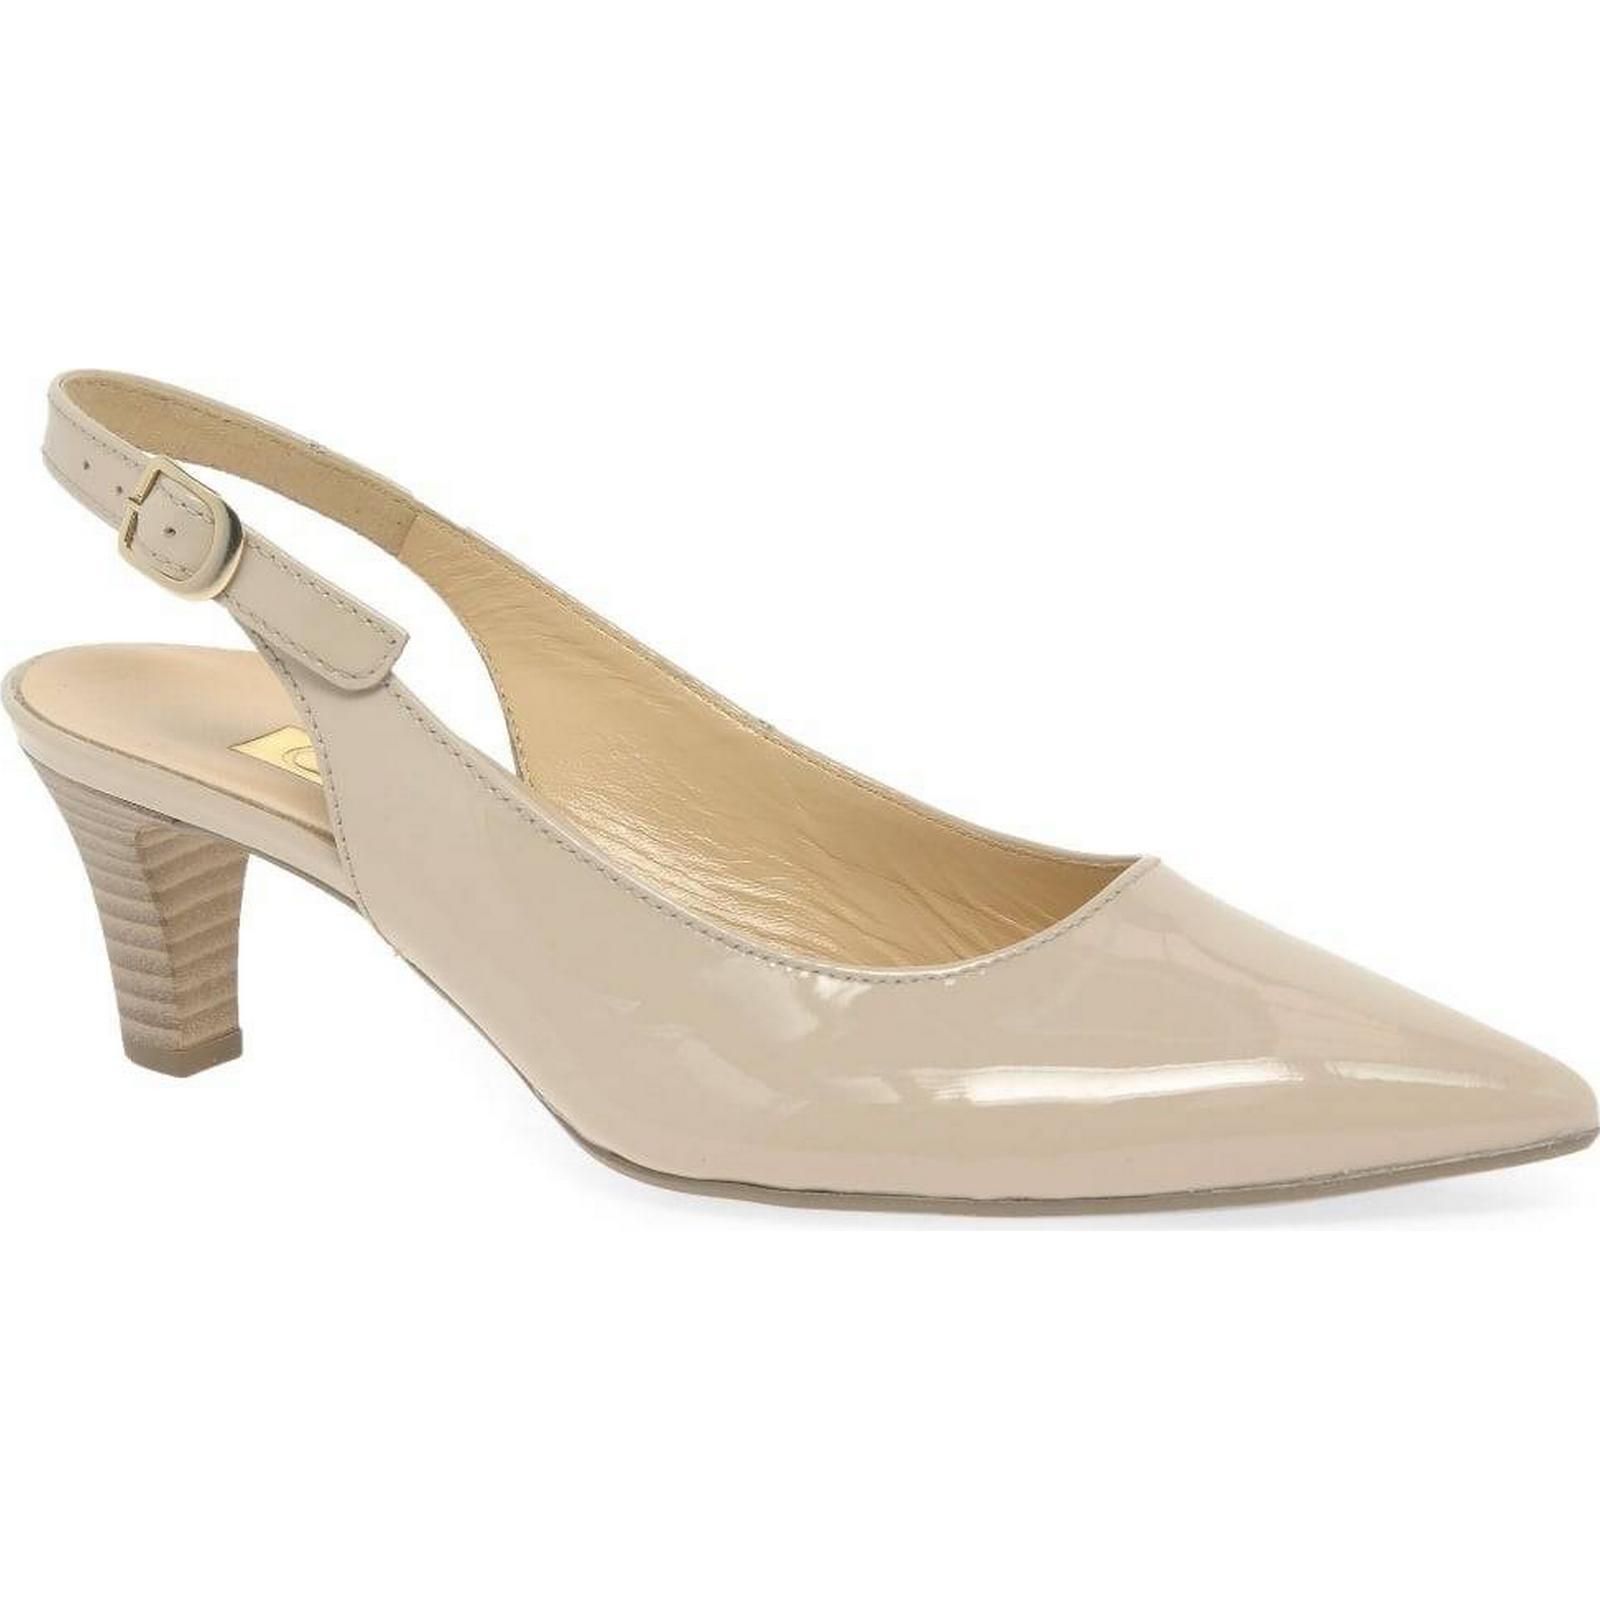 Gabor Hume Shoes 2 Womens Open Court Shoes Hume Colour: Sand Patent Hi Tec, Size: 97fd82